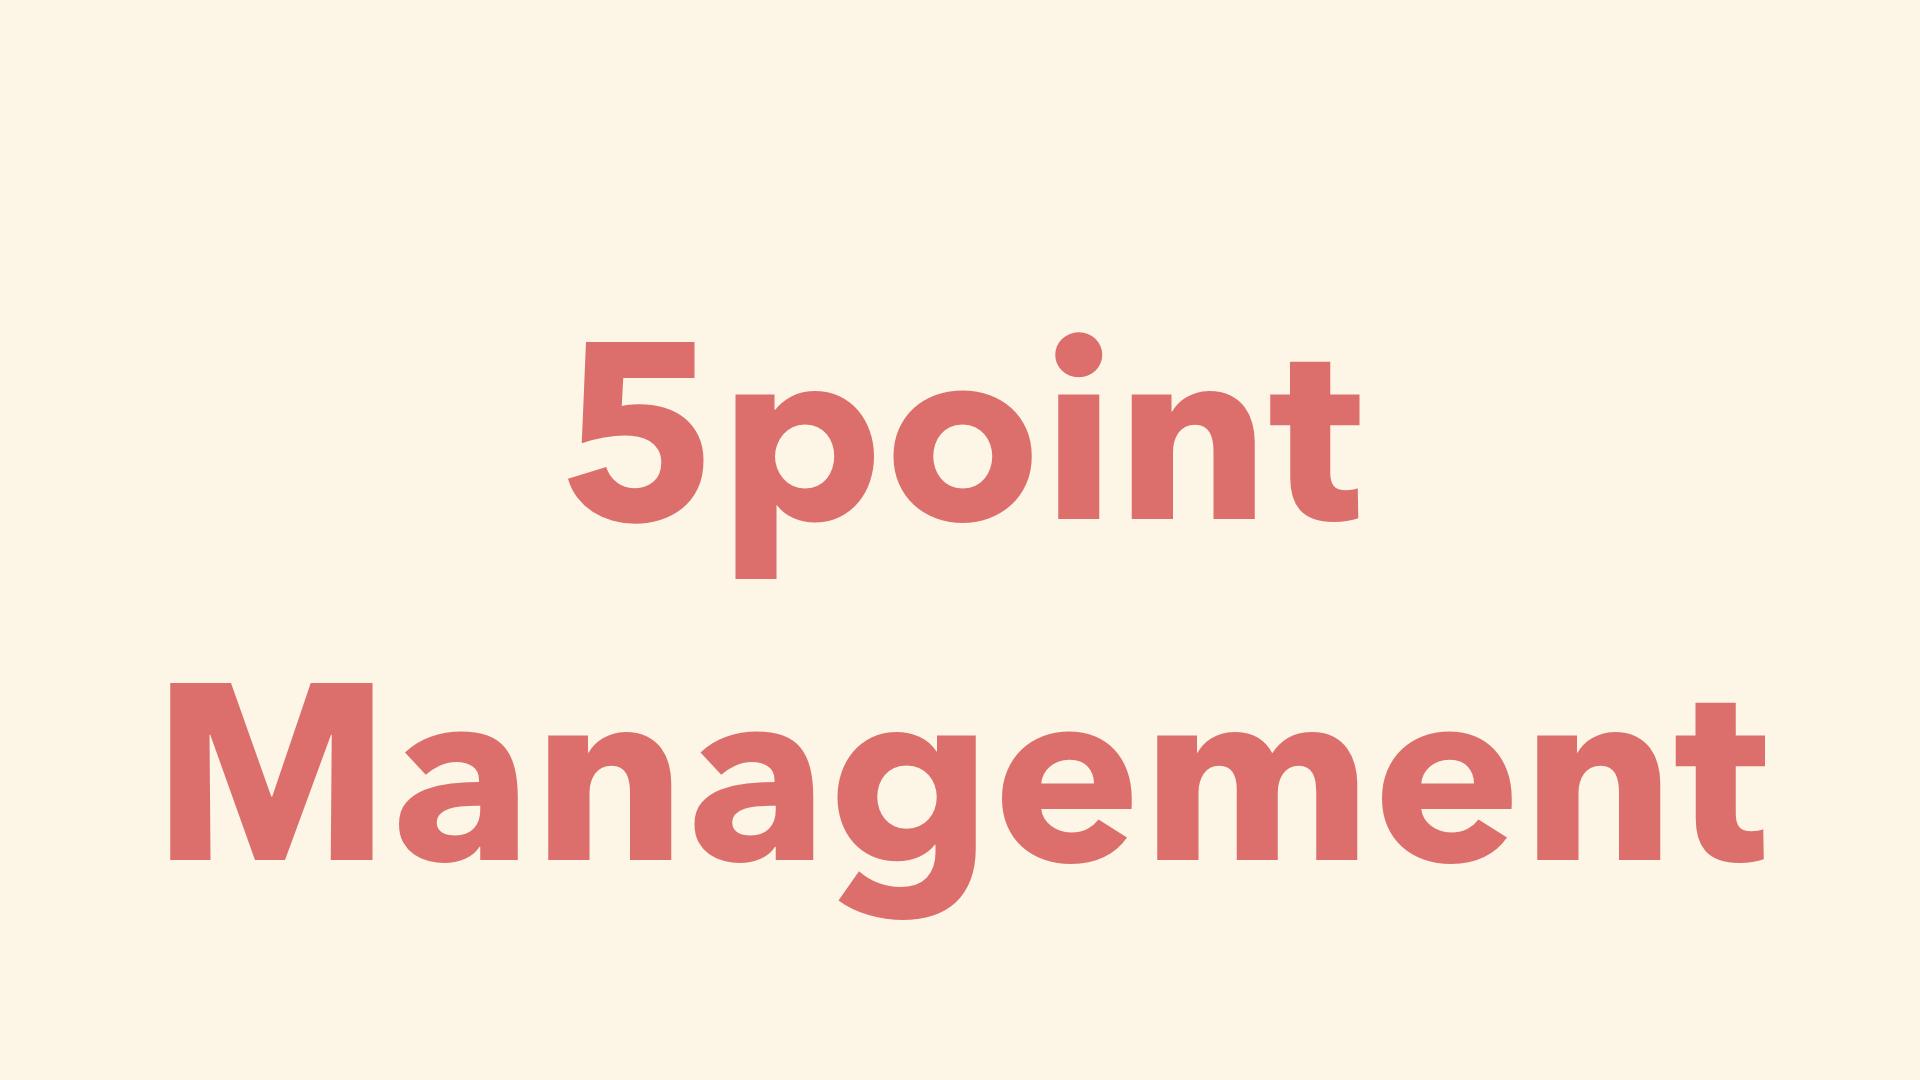 5point management